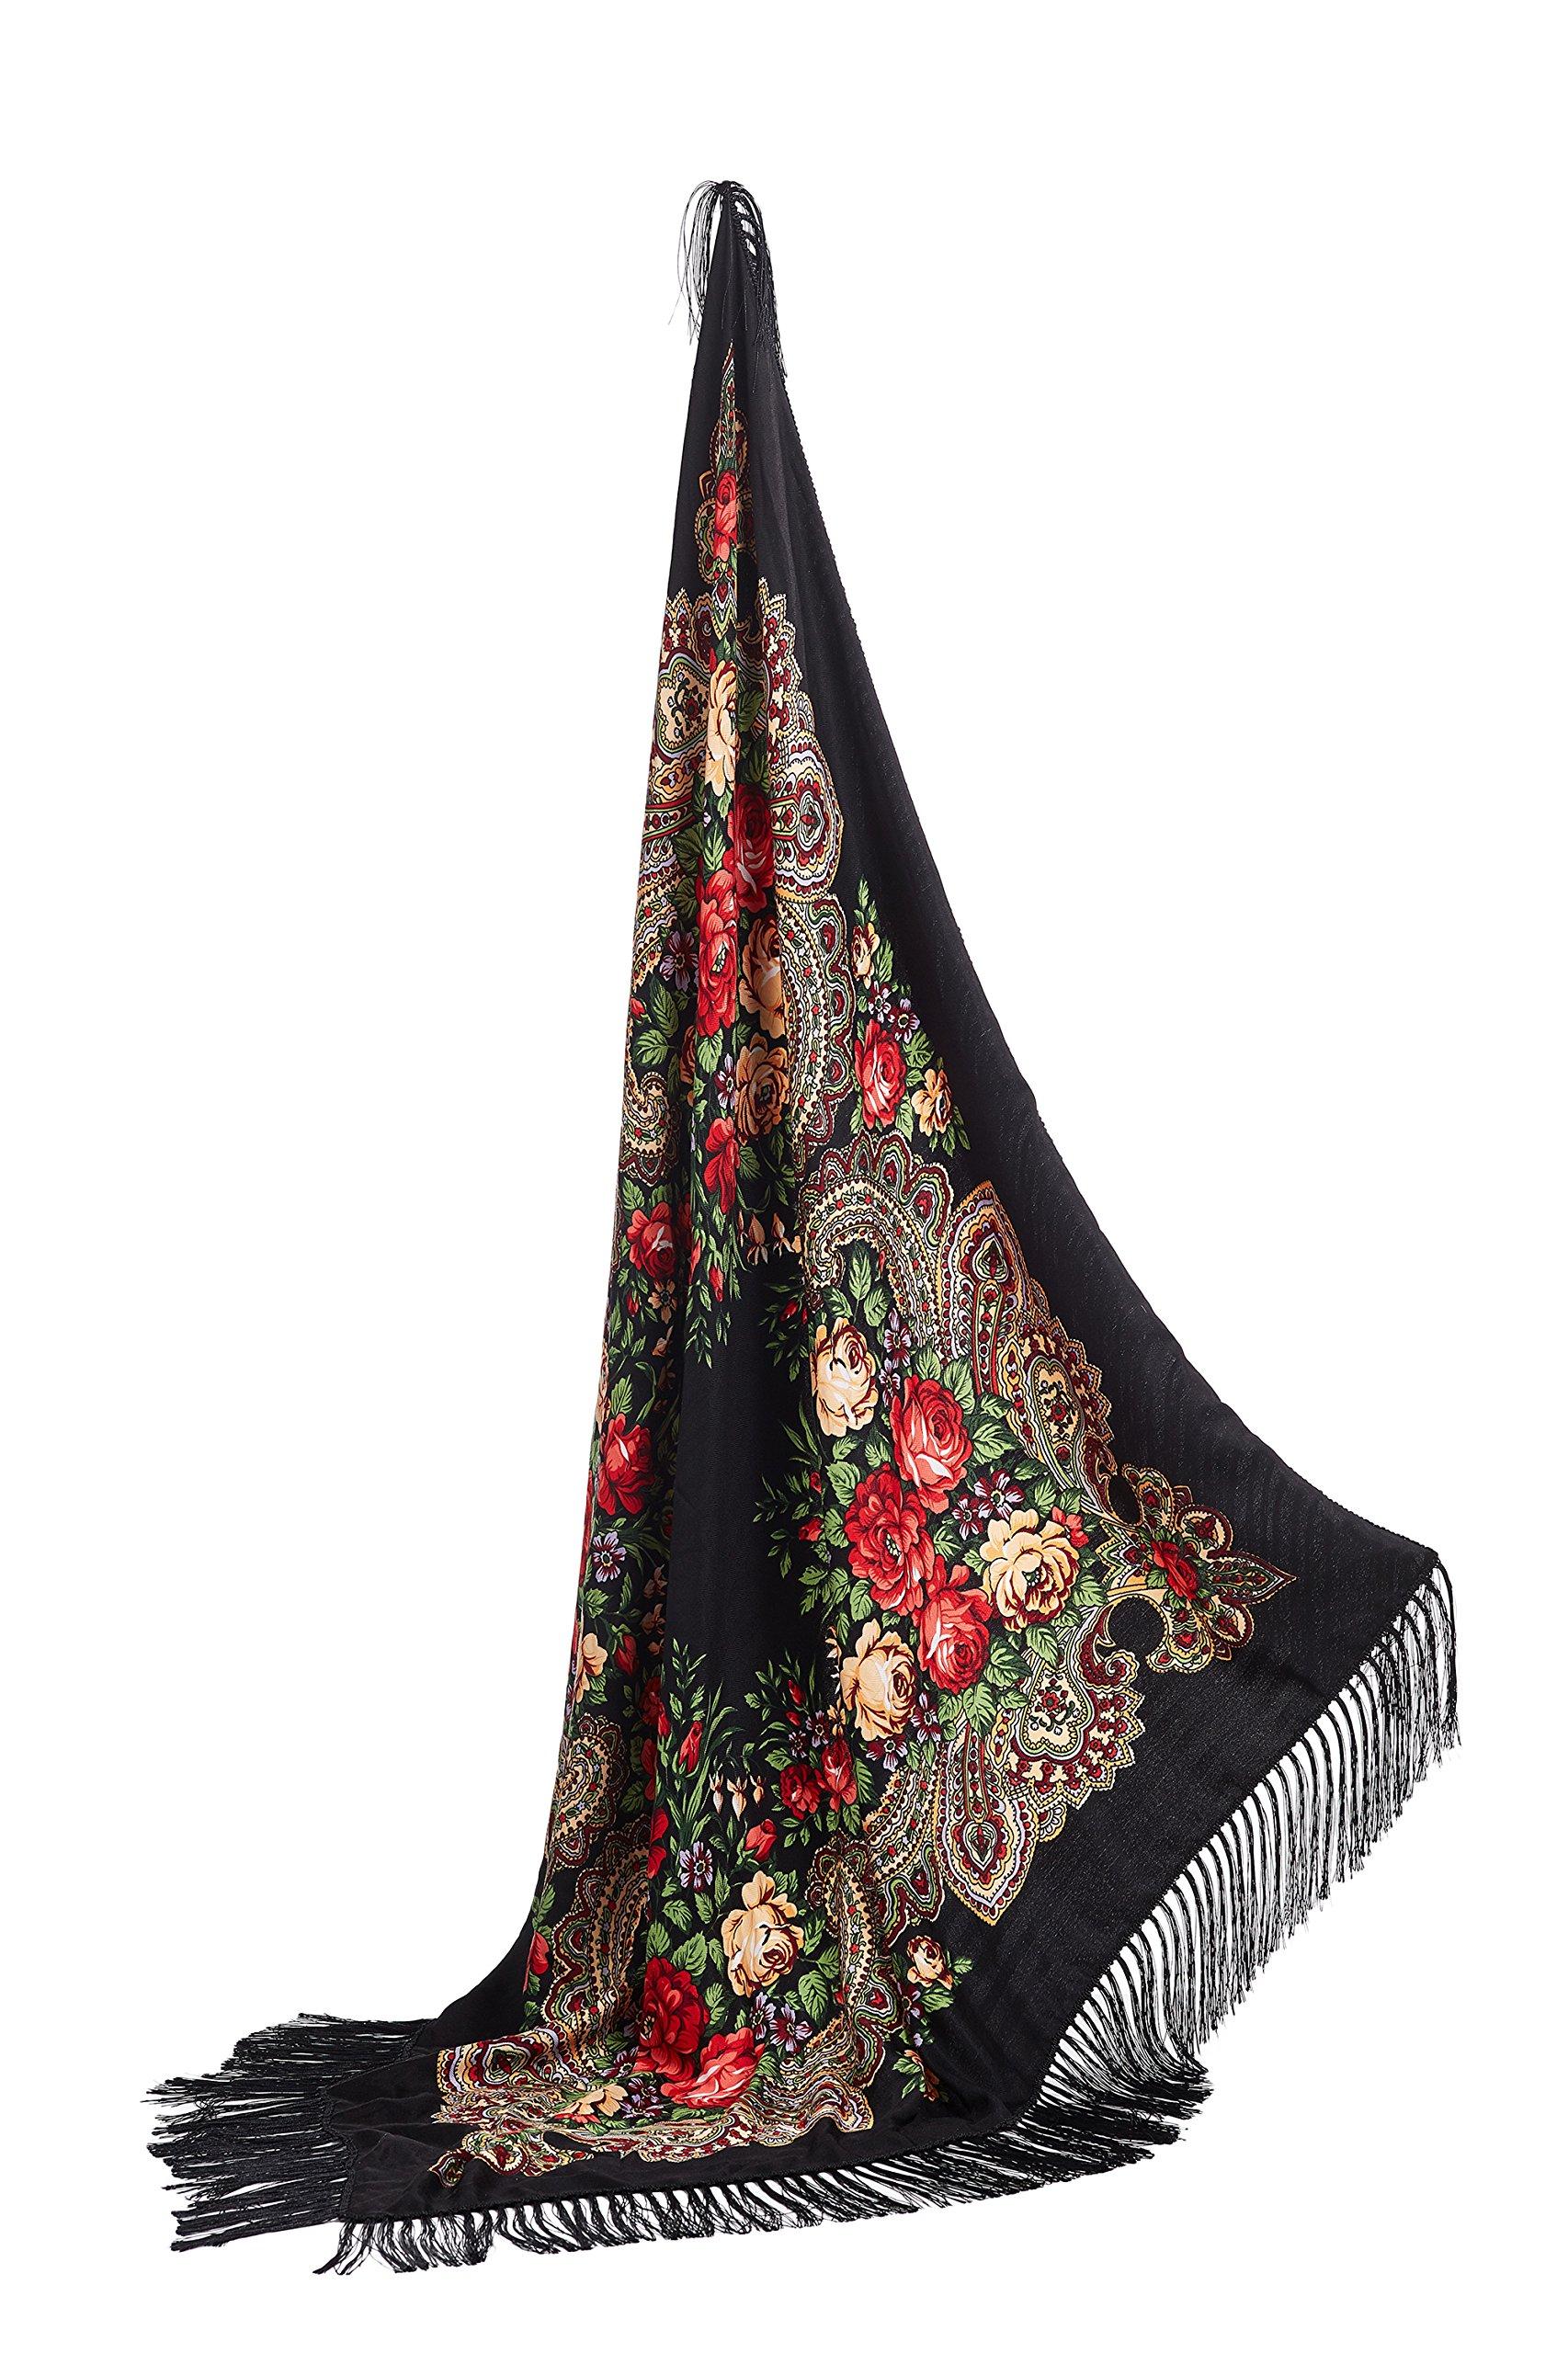 Ladies Tassel Shawl With Roses Ukrainian Polish Russian Floral Head Wrap 44'' x 44'' (black)